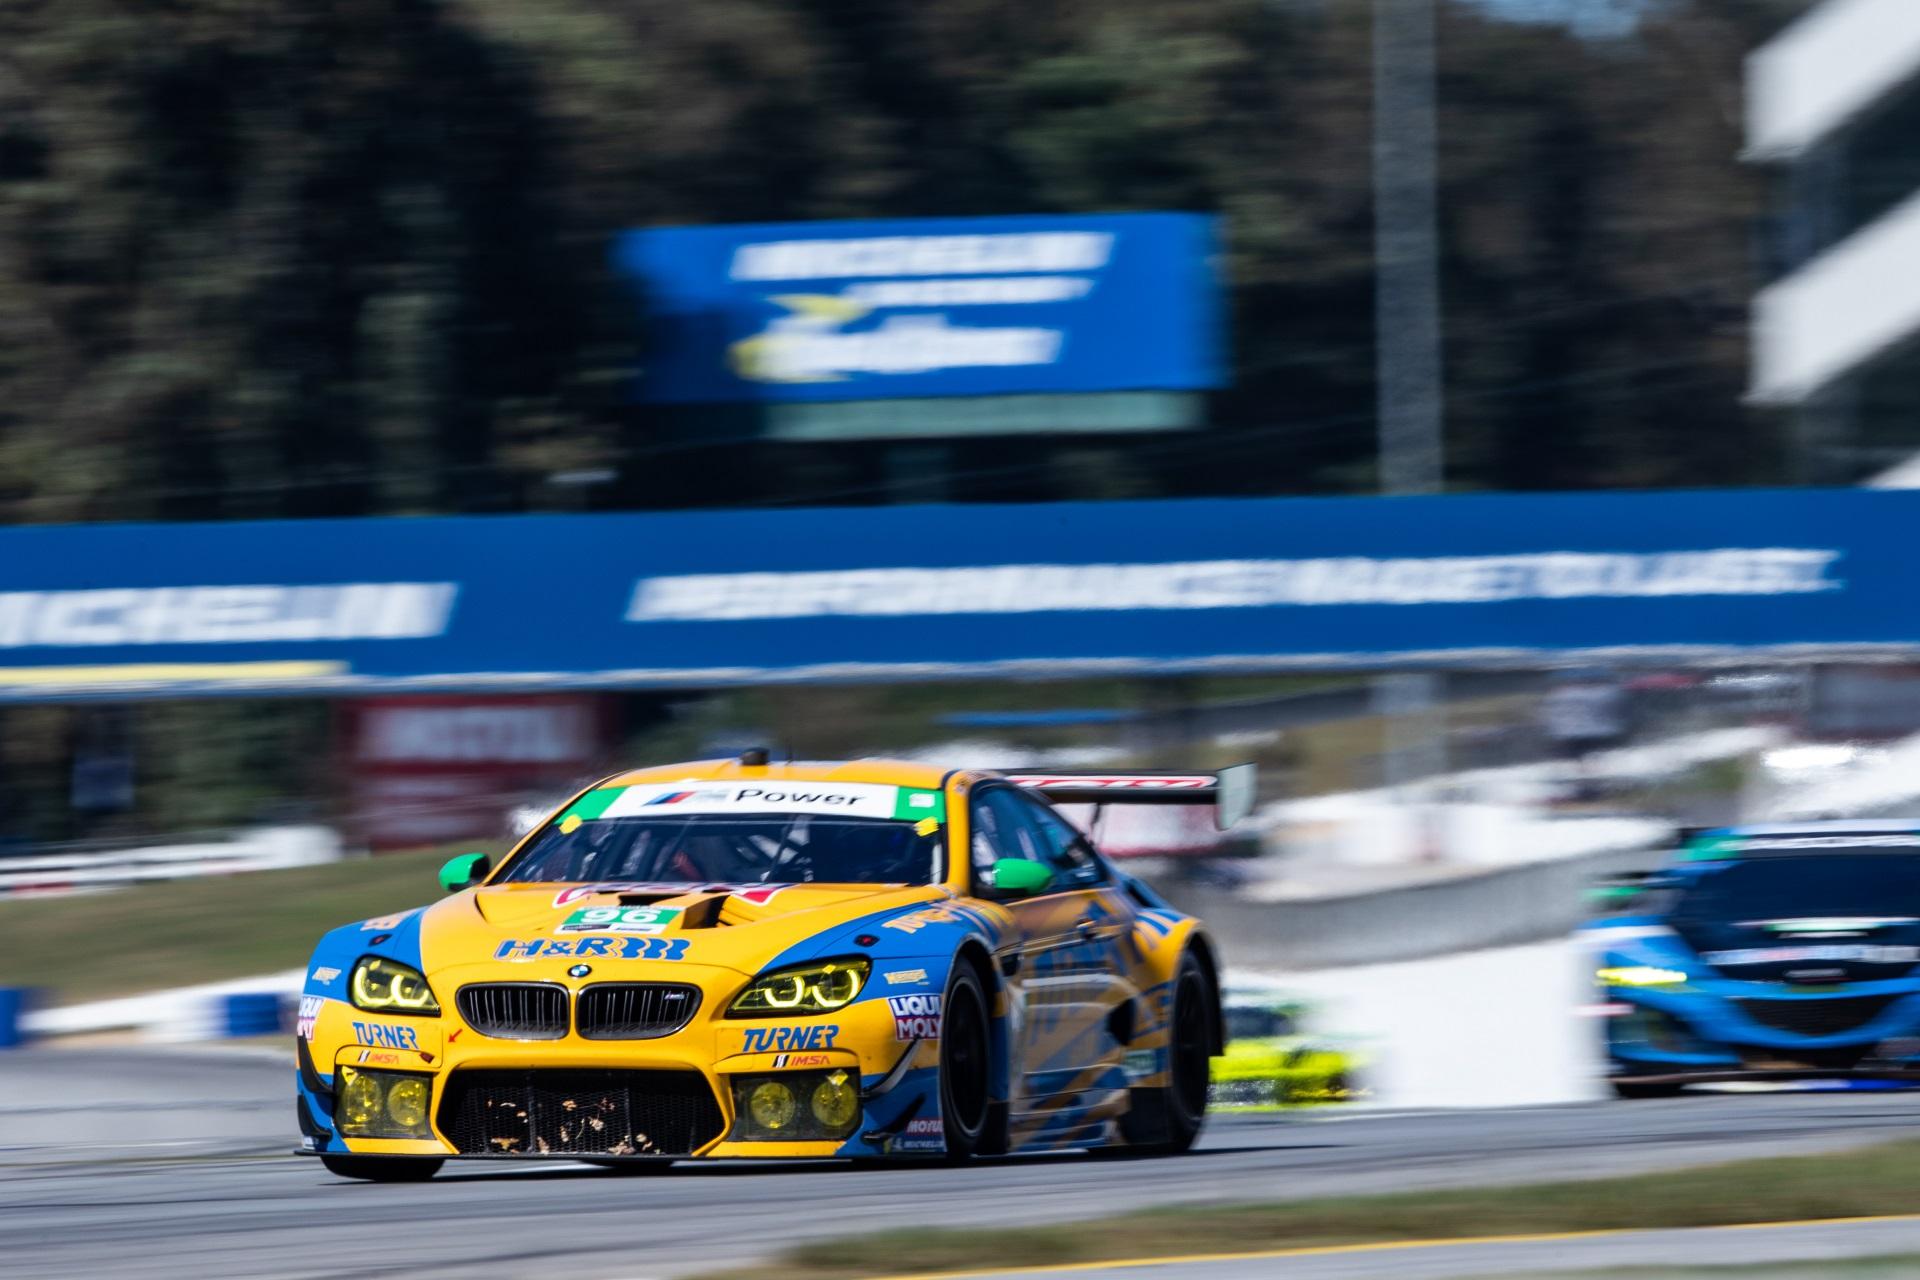 BMW Team RLL claims 6th consecutive podium finish at Petit Le Mans